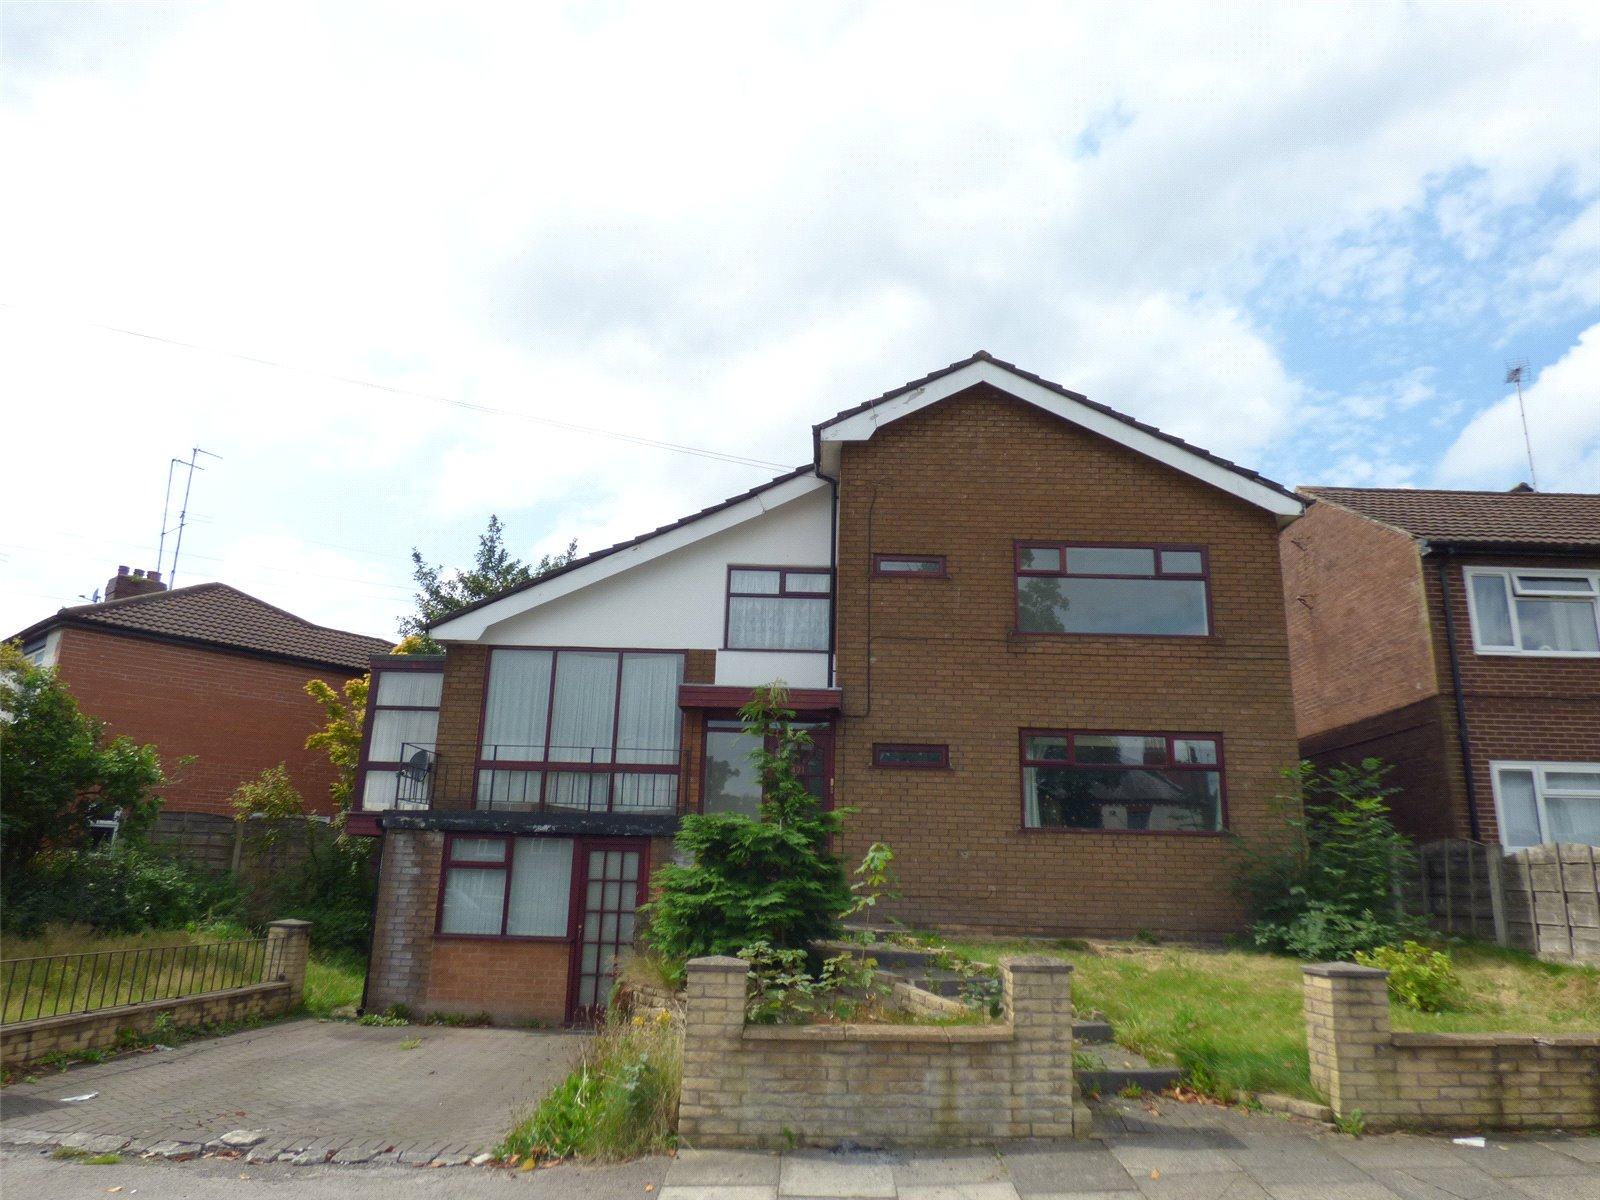 4 Bedrooms Detached House for sale in Middleton Road, Rhodes, Middleton, Manchester, M24